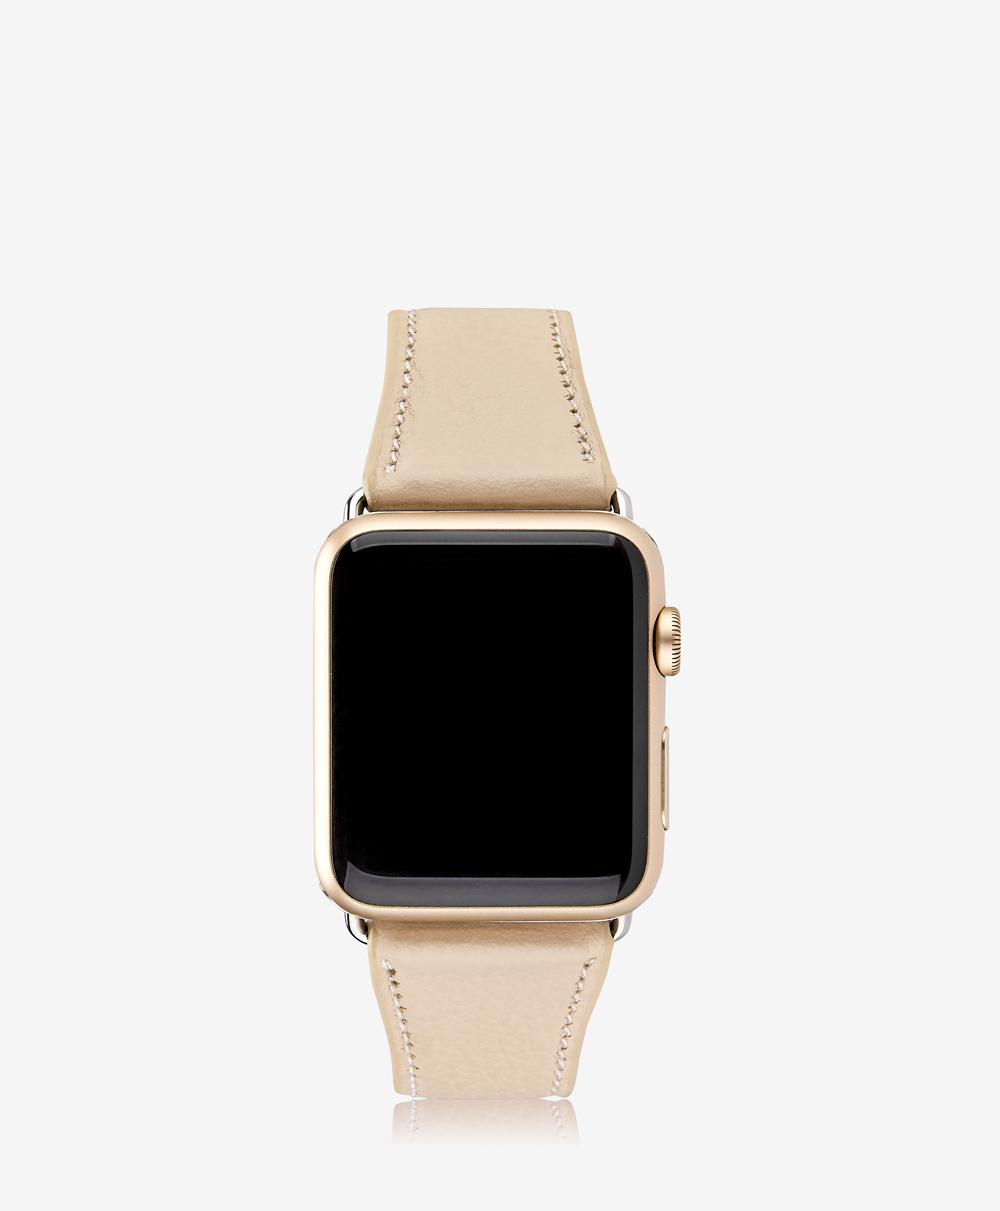 42mm Apple Watch Band Almond Pebble Grain AWS-42MS-FLO-ALM